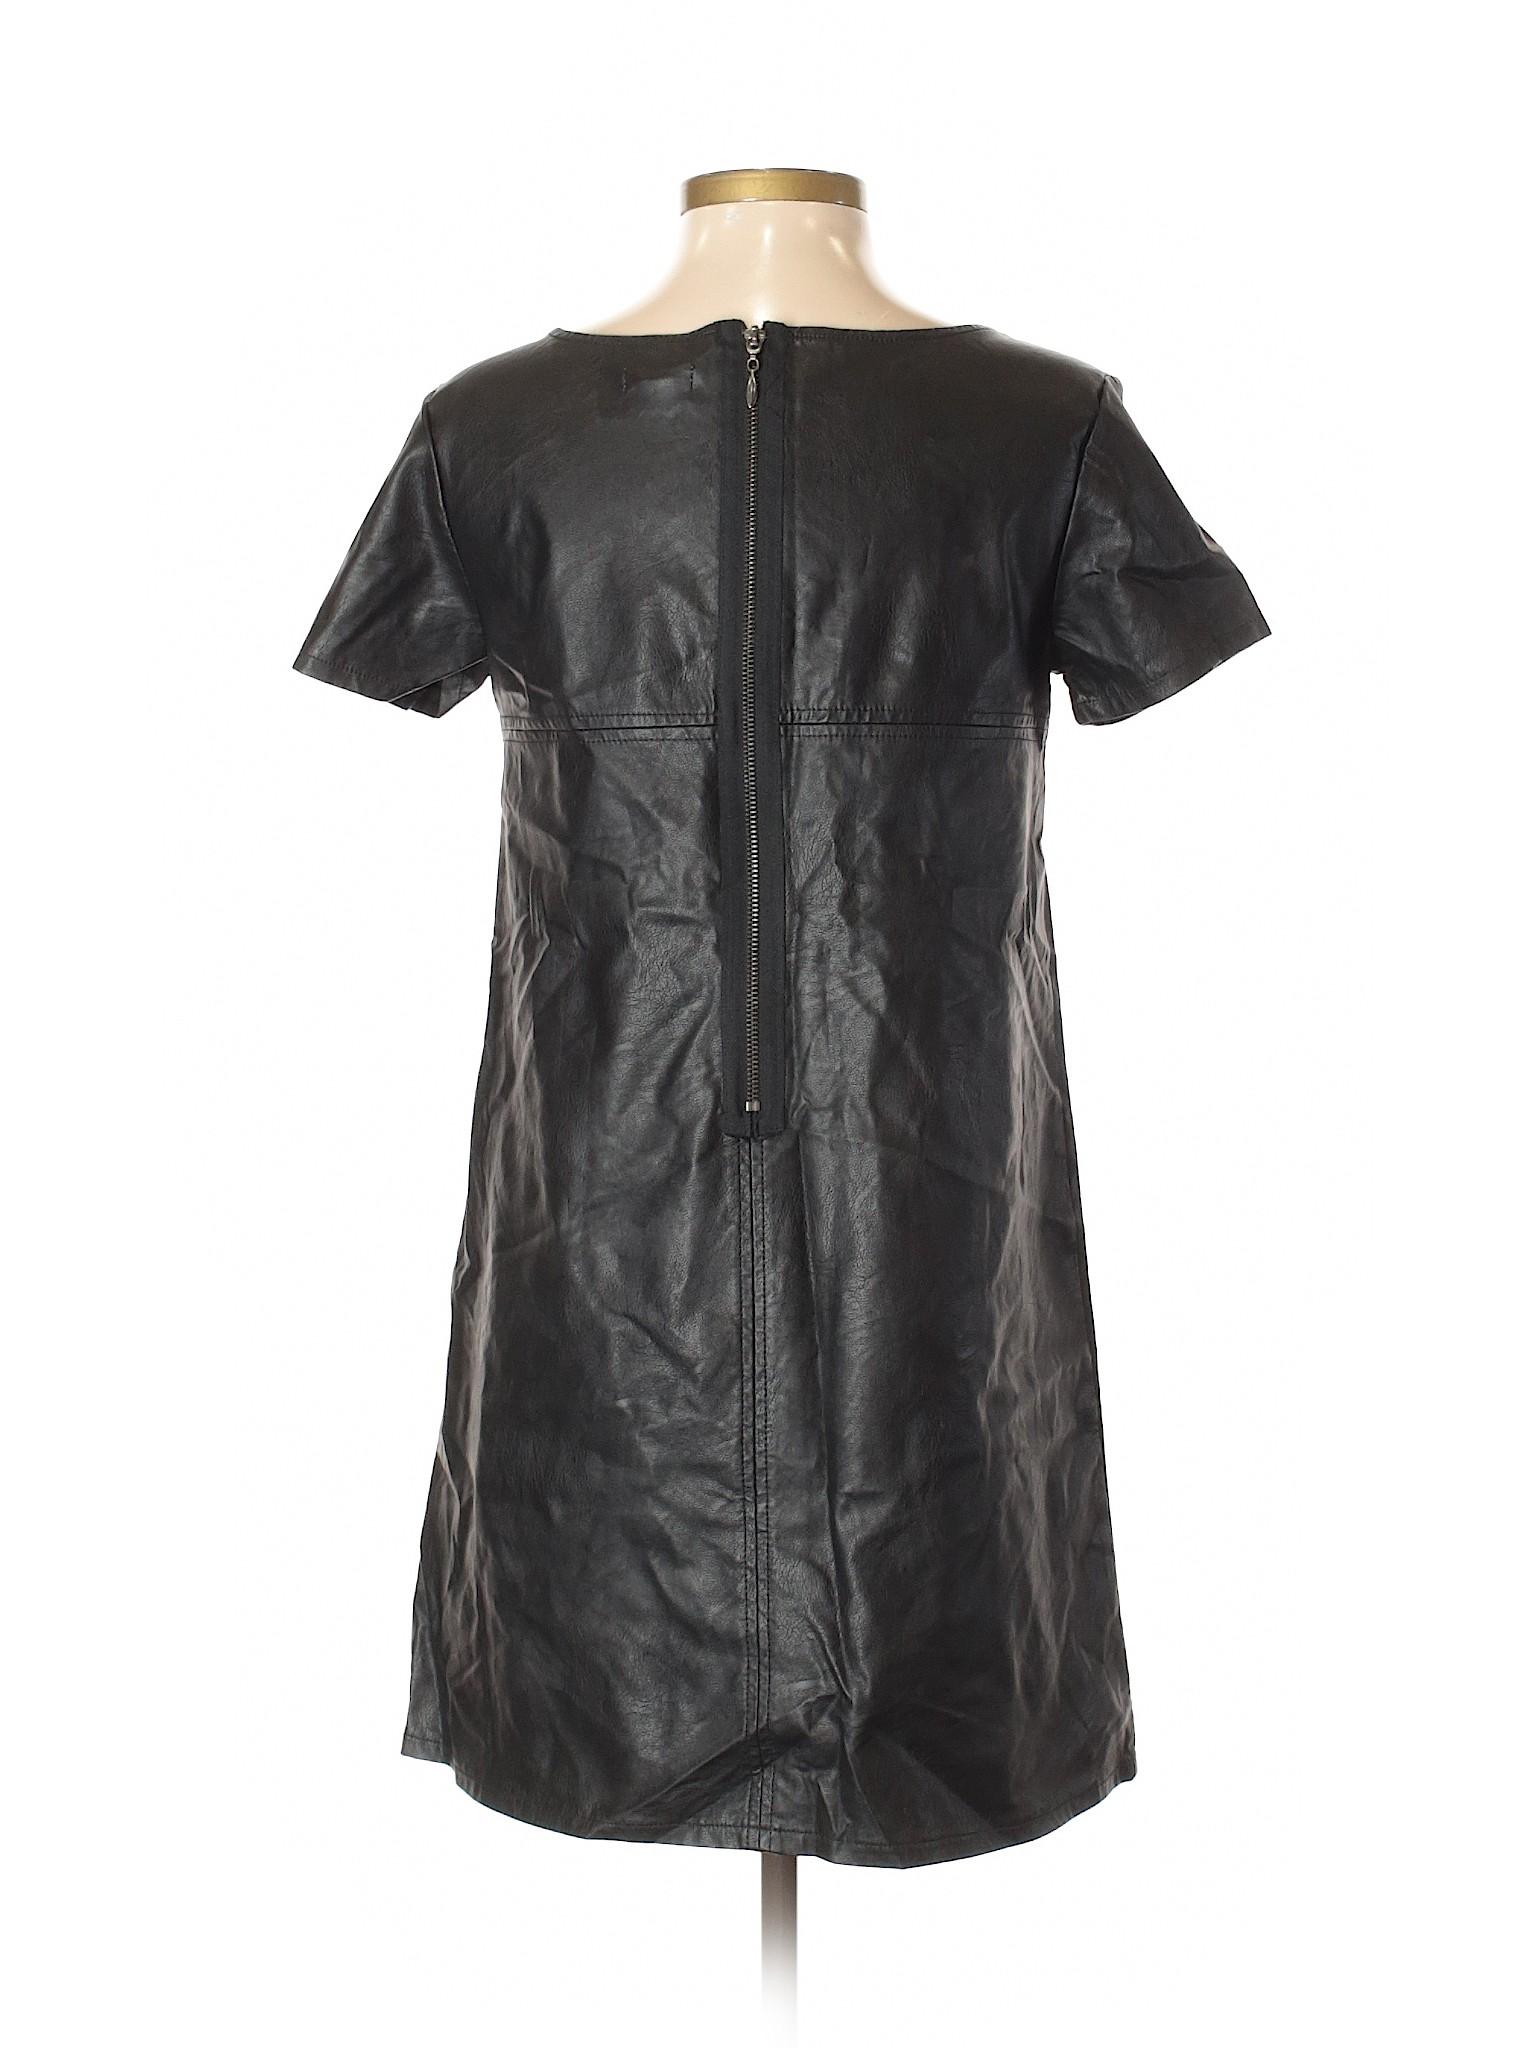 Xhilaration Boutique Boutique Xhilaration Boutique winter Xhilaration Dress Boutique Casual Casual winter Dress Dress winter Casual 7gACxqn